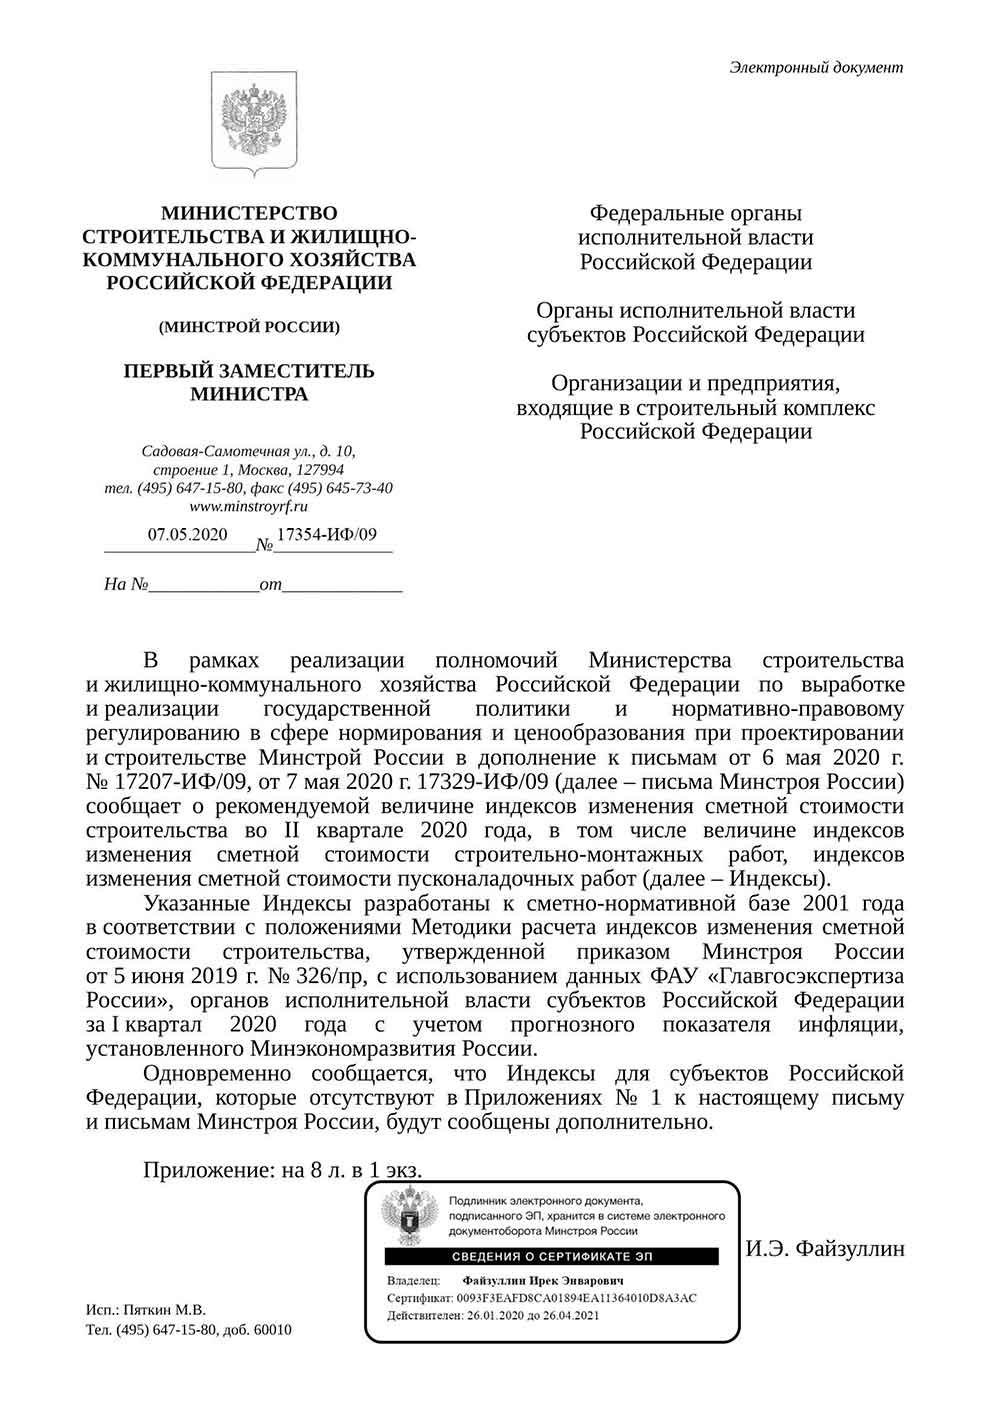 Письмо Минстроя РФ №17354-ИФ/09 от 07.05.2020 г.